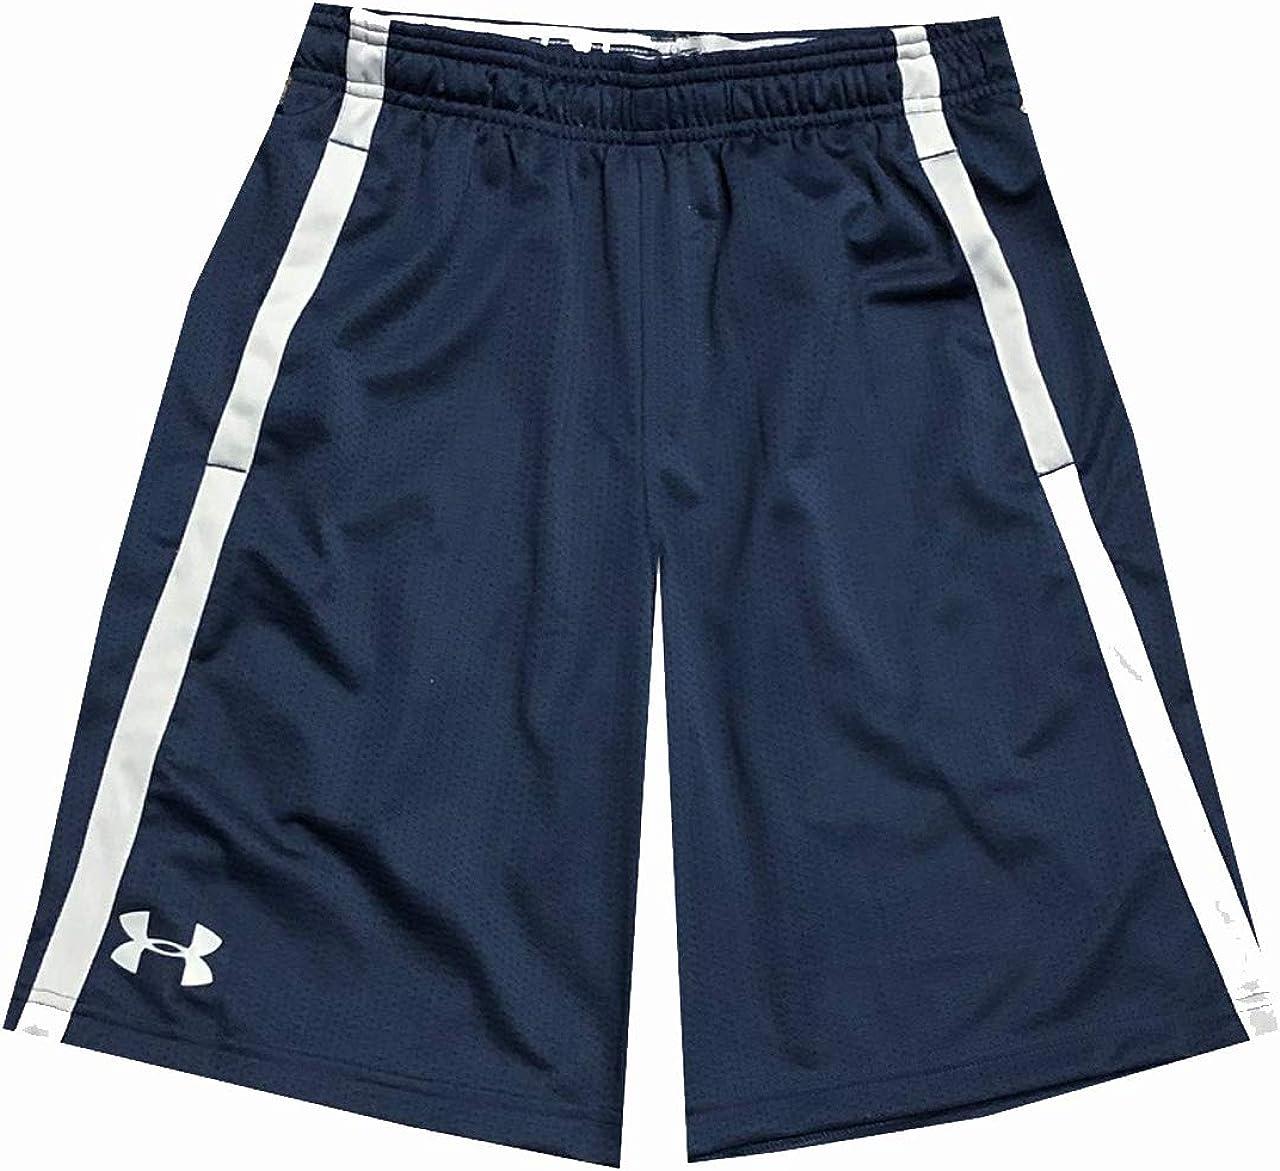 Under Armour Men's UA Tech HeatGear Athletic Mesh Shorts (XL, Navy): Clothing